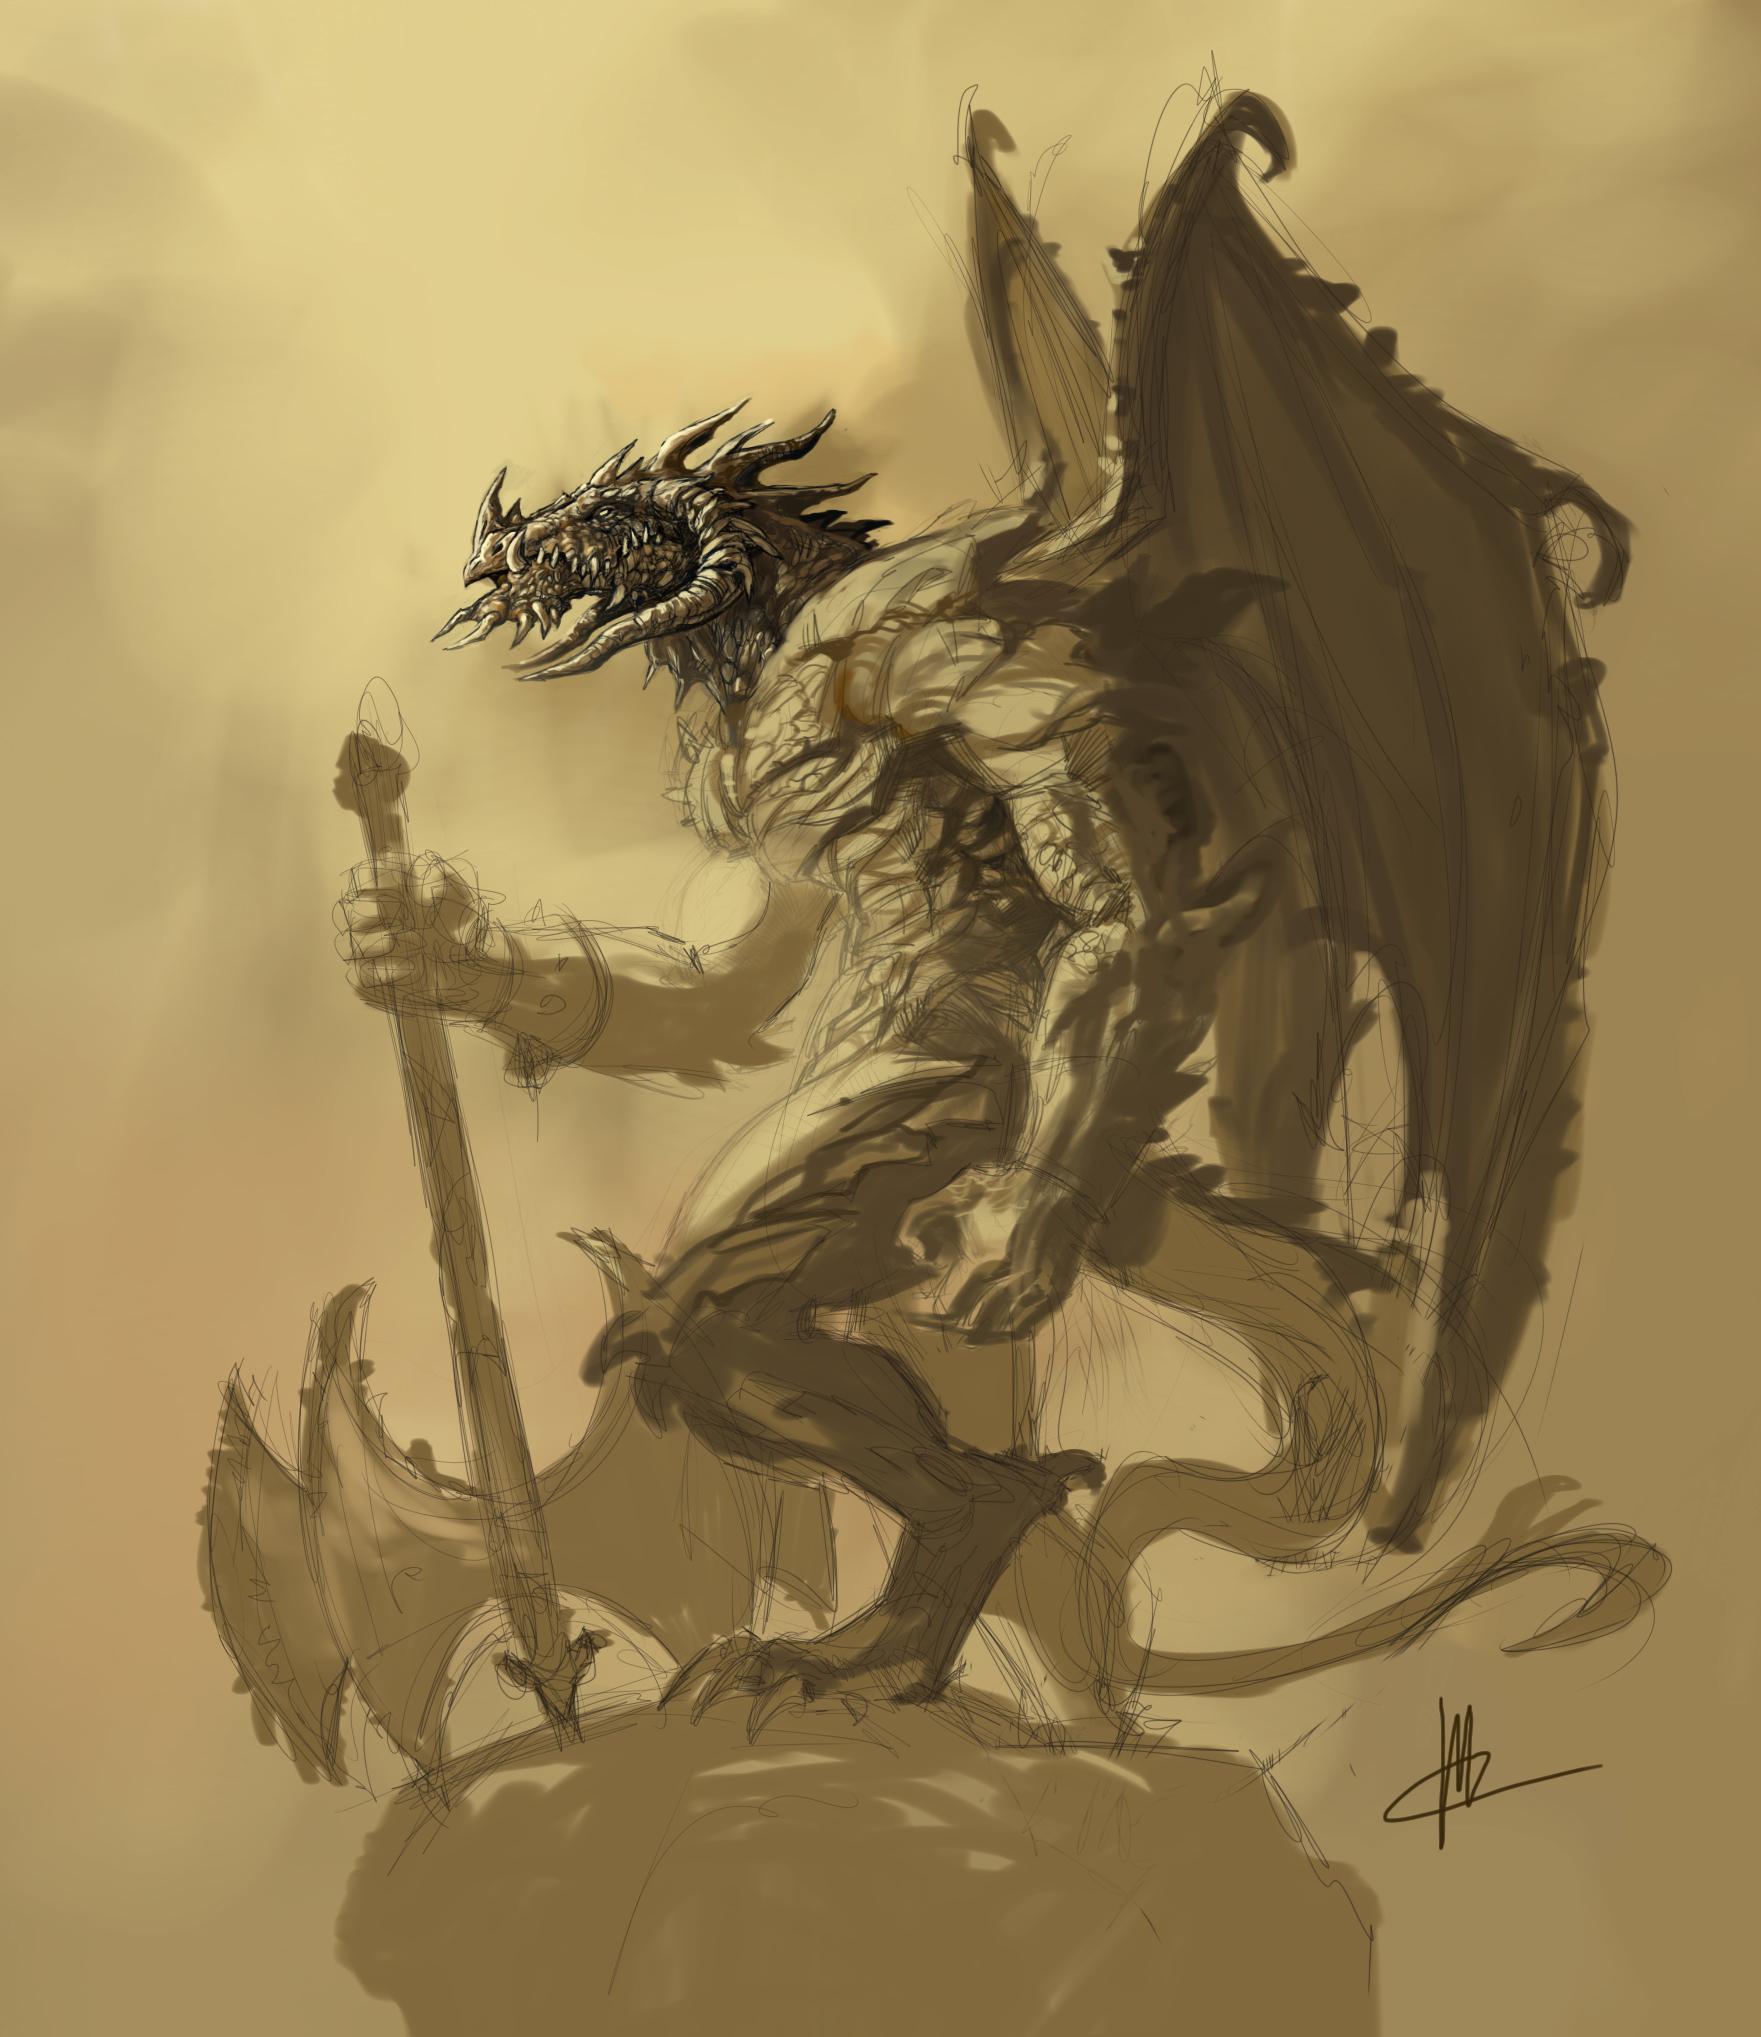 Humanoid_dragon_by_TheBeke.jpg